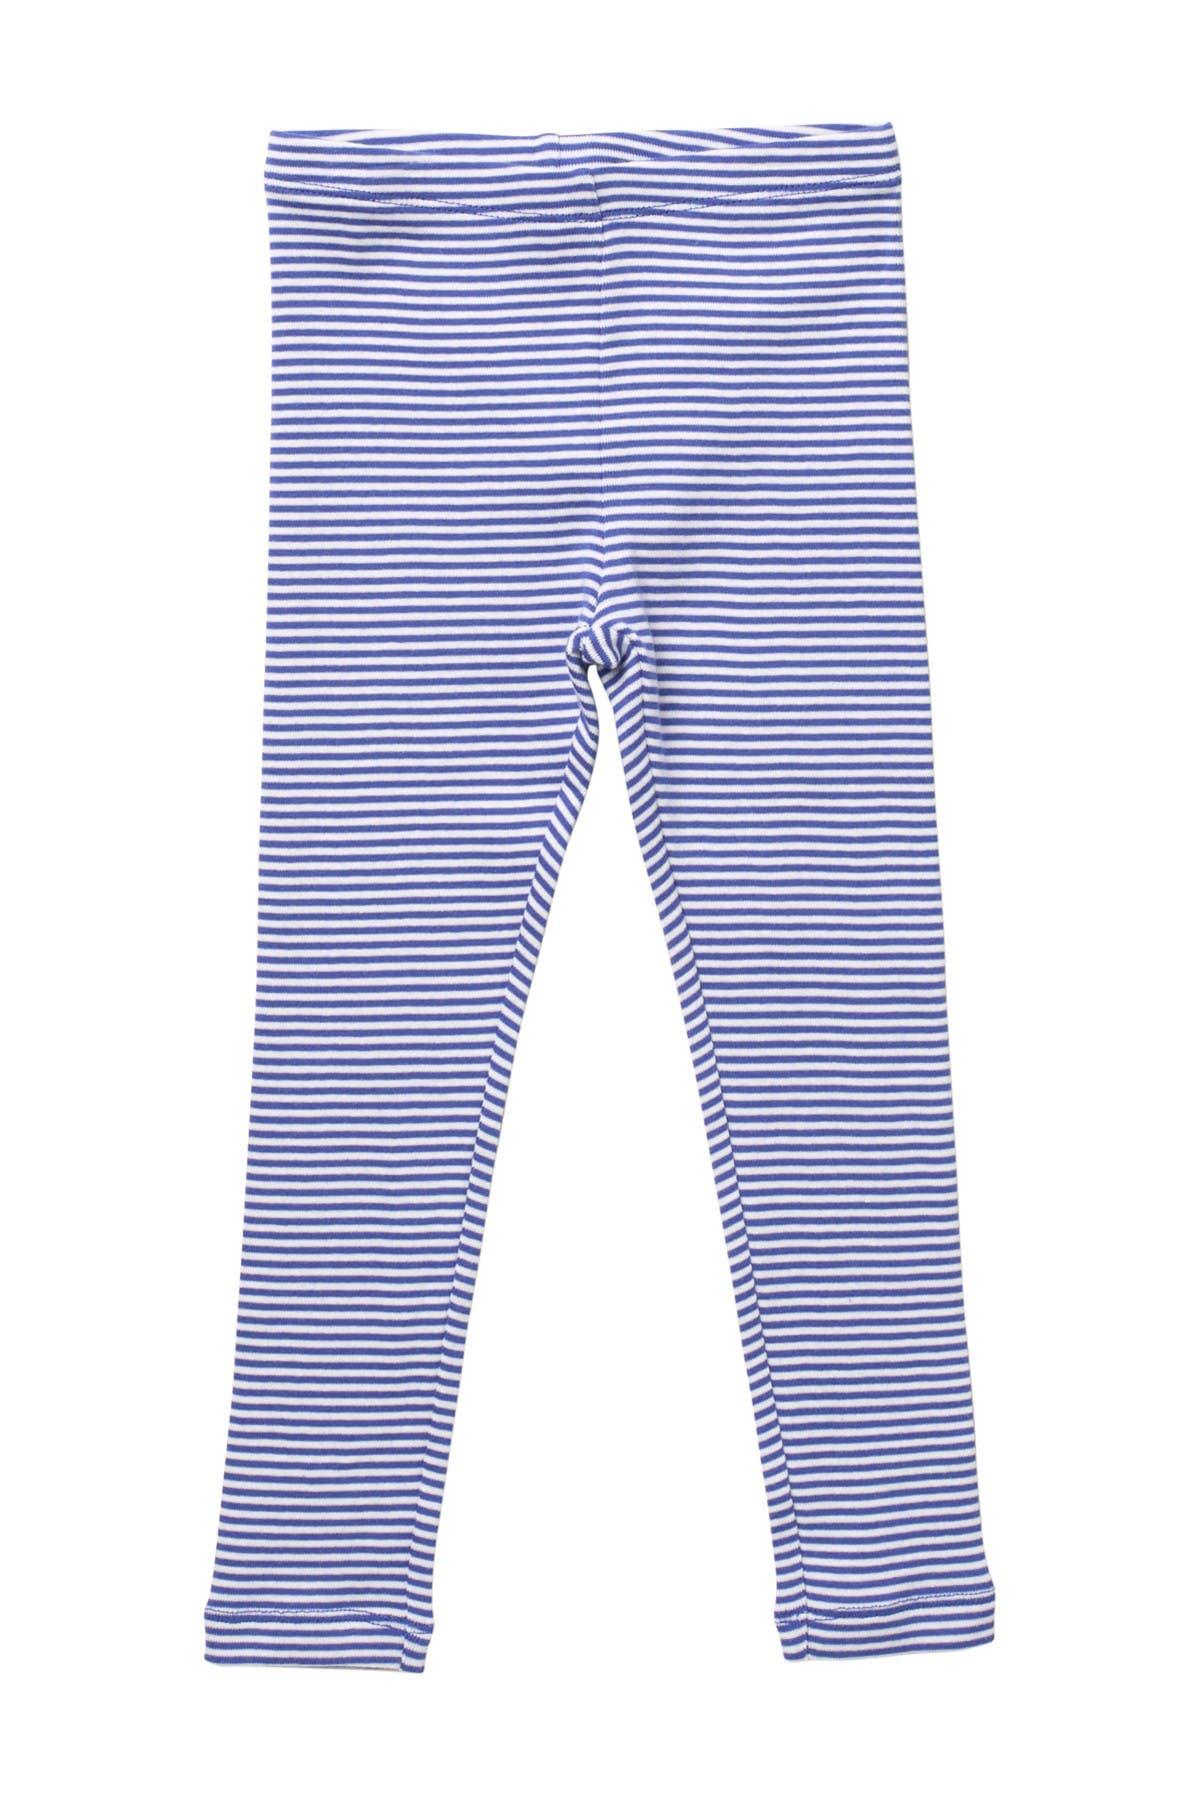 Image of Tea Collection Stripe Knit Leggings